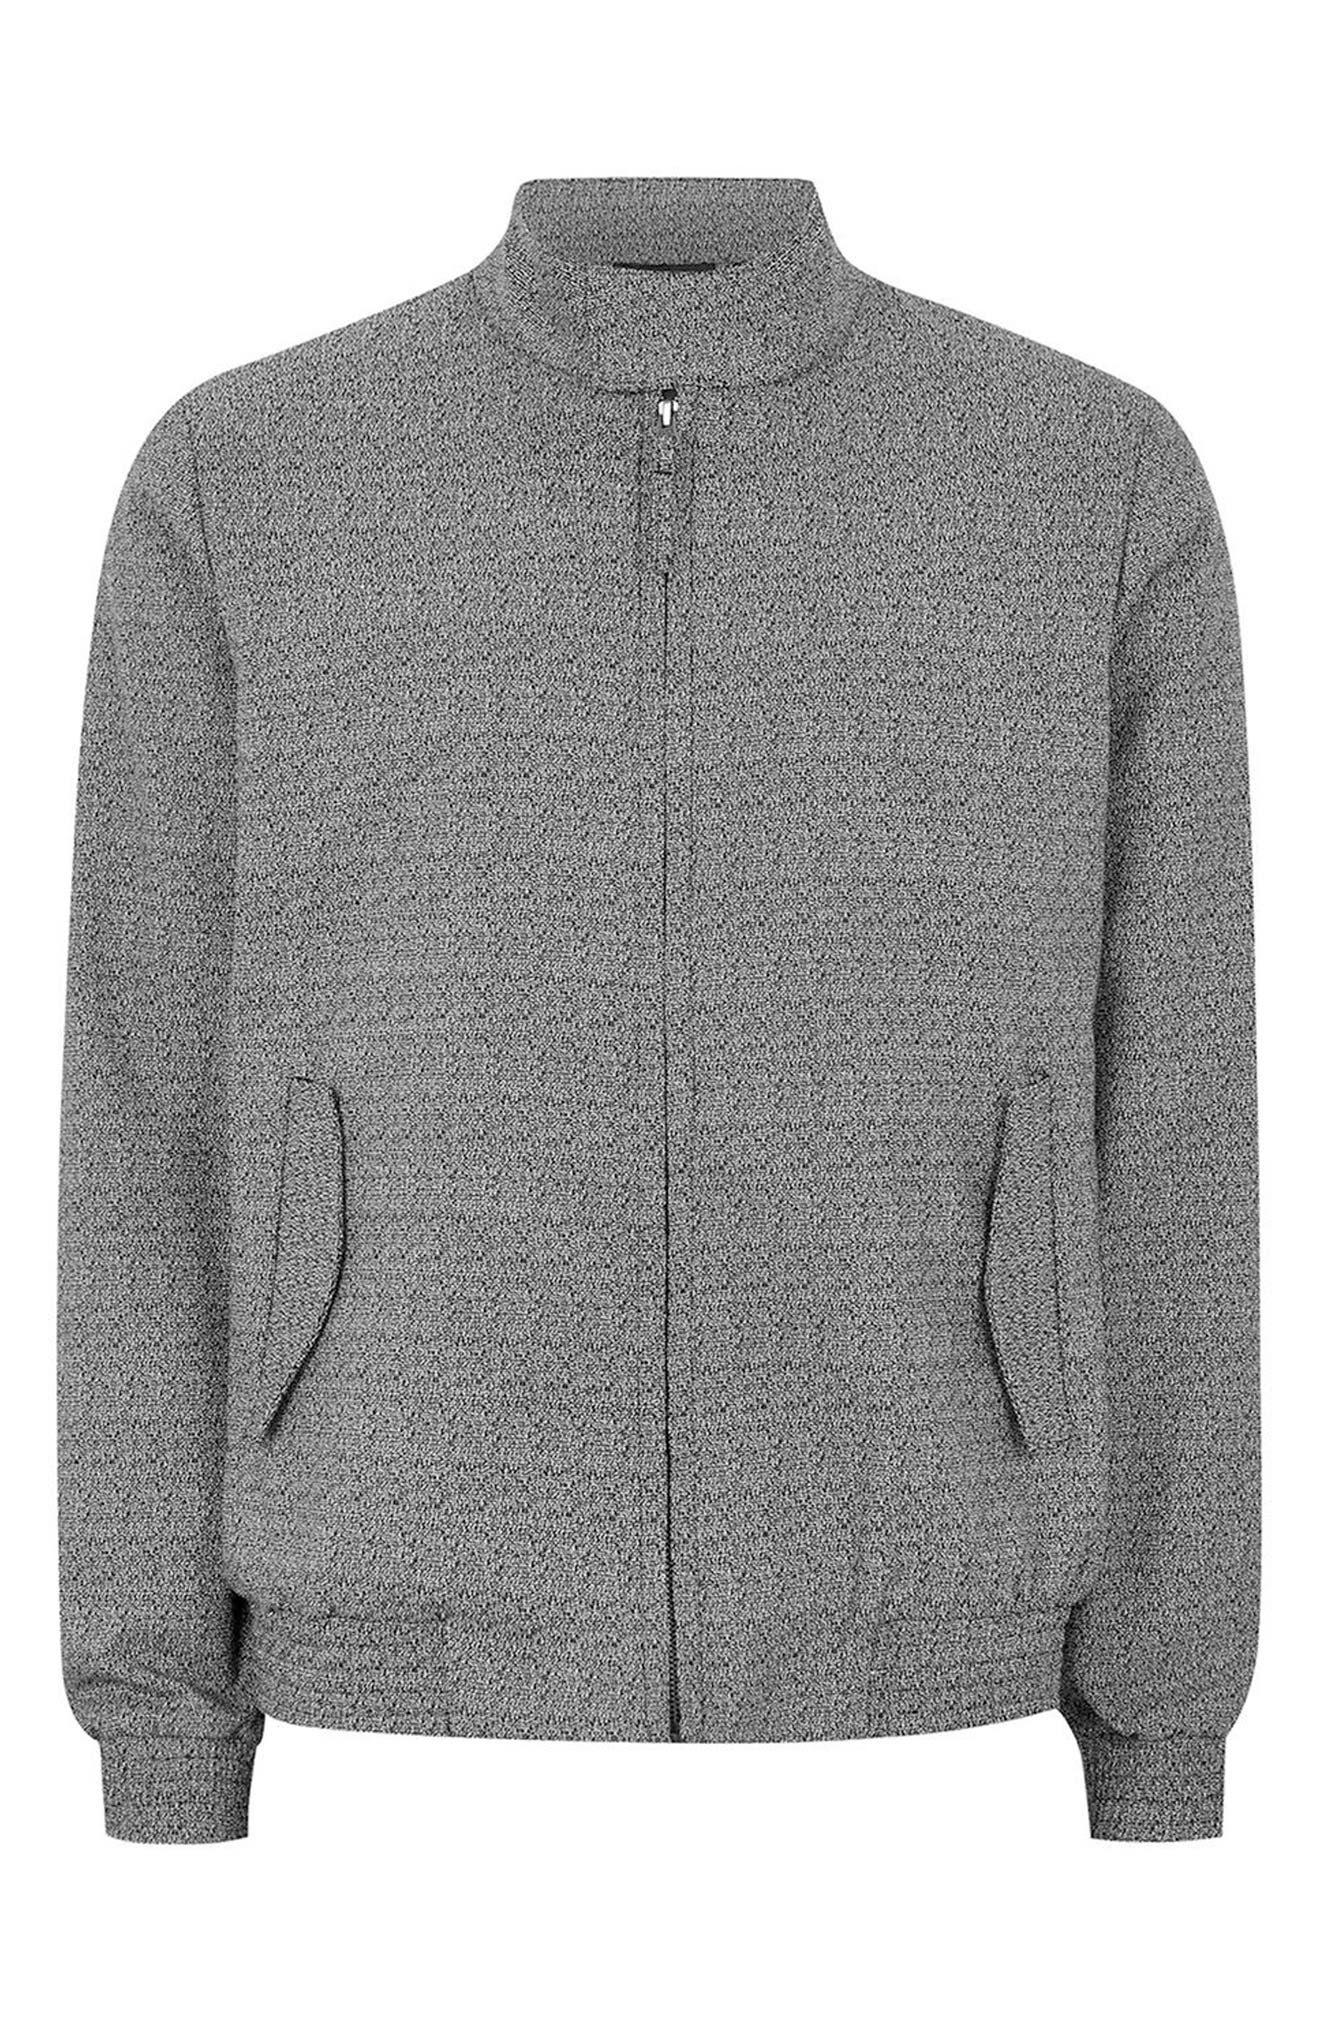 Alternate Image 4  - Topman Textured Harrington Jacket